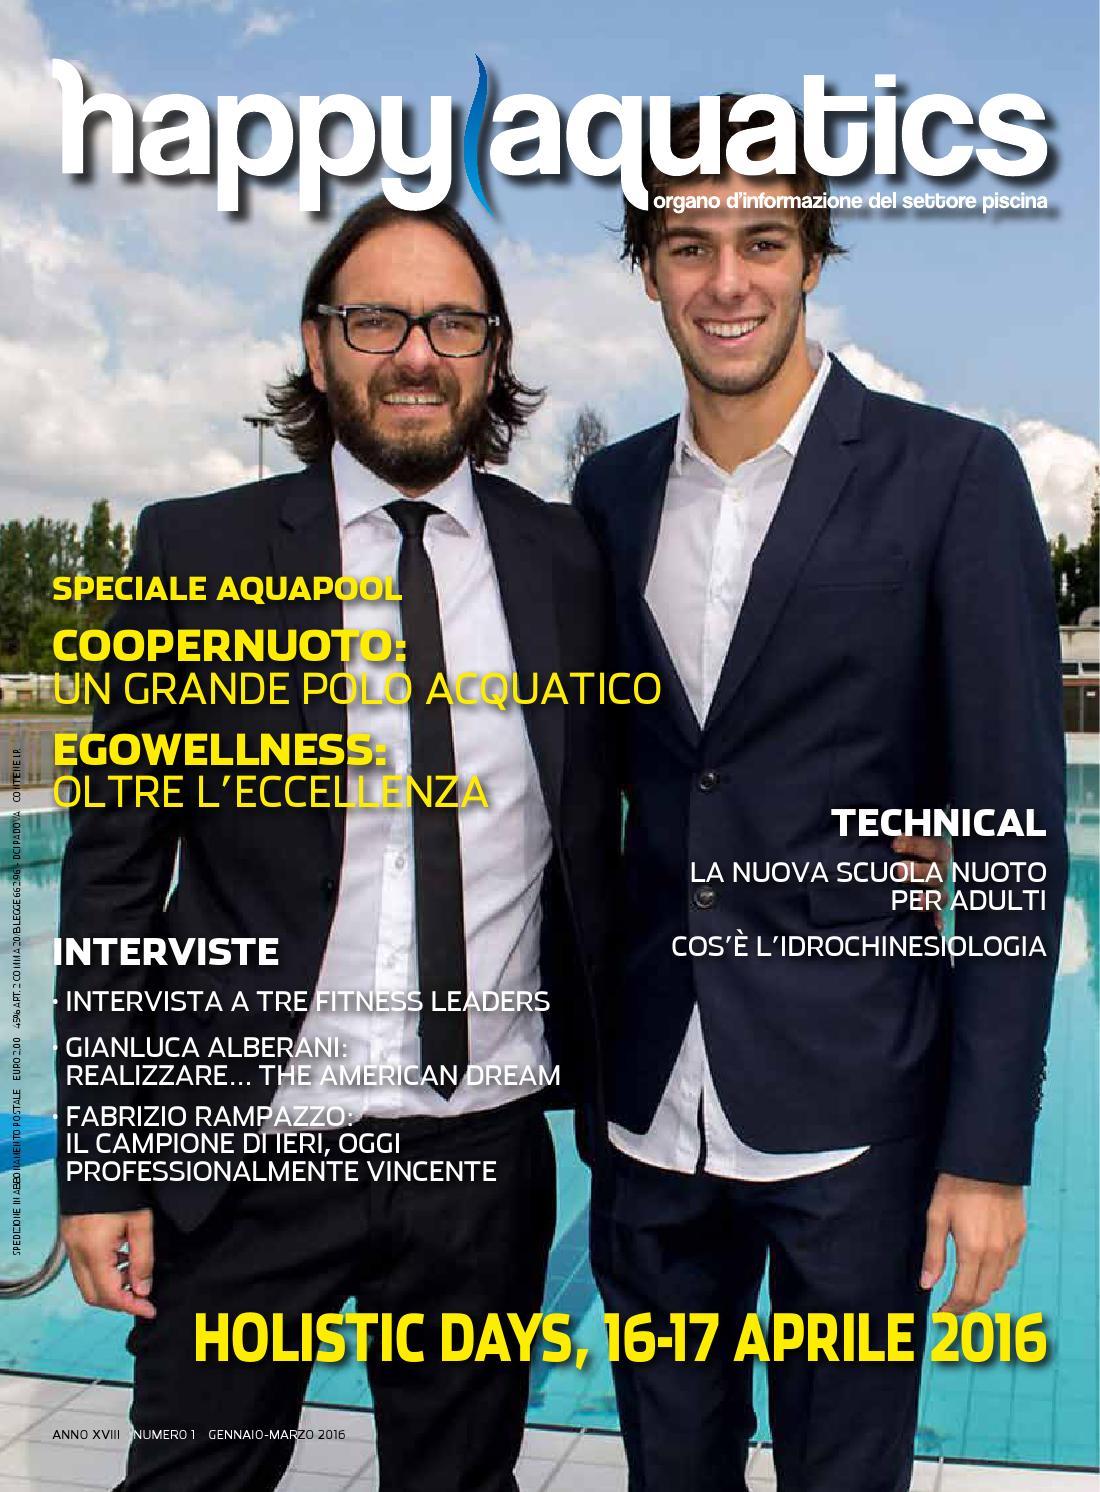 Happy Aquatics n.1 anno 2016 - ITA by Happy Aquatics   Wellness - issuu 942415607cda